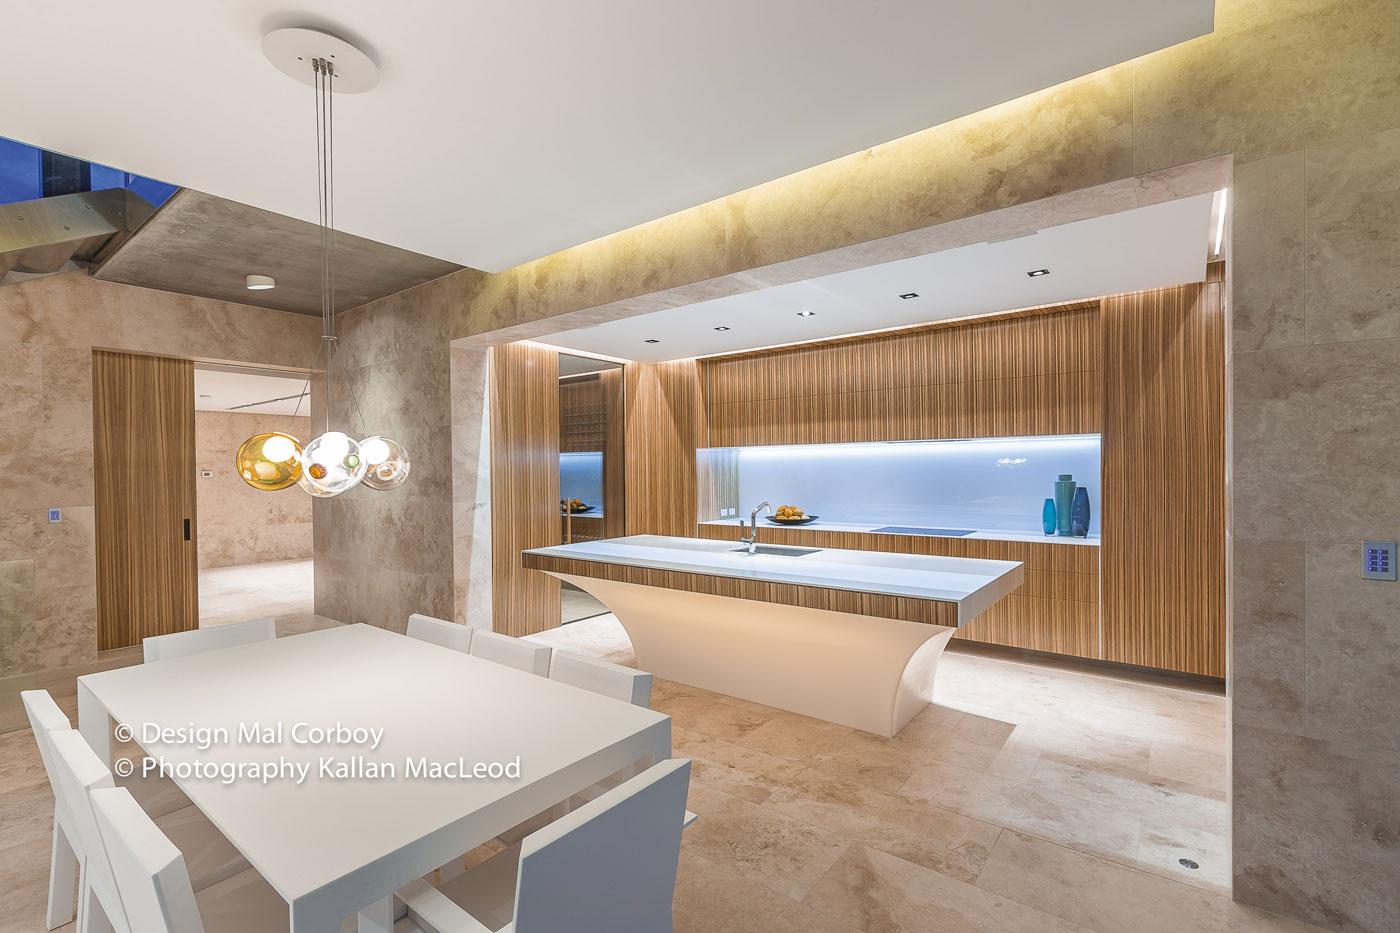 waiheke island new zealand voted best kitchen in the world